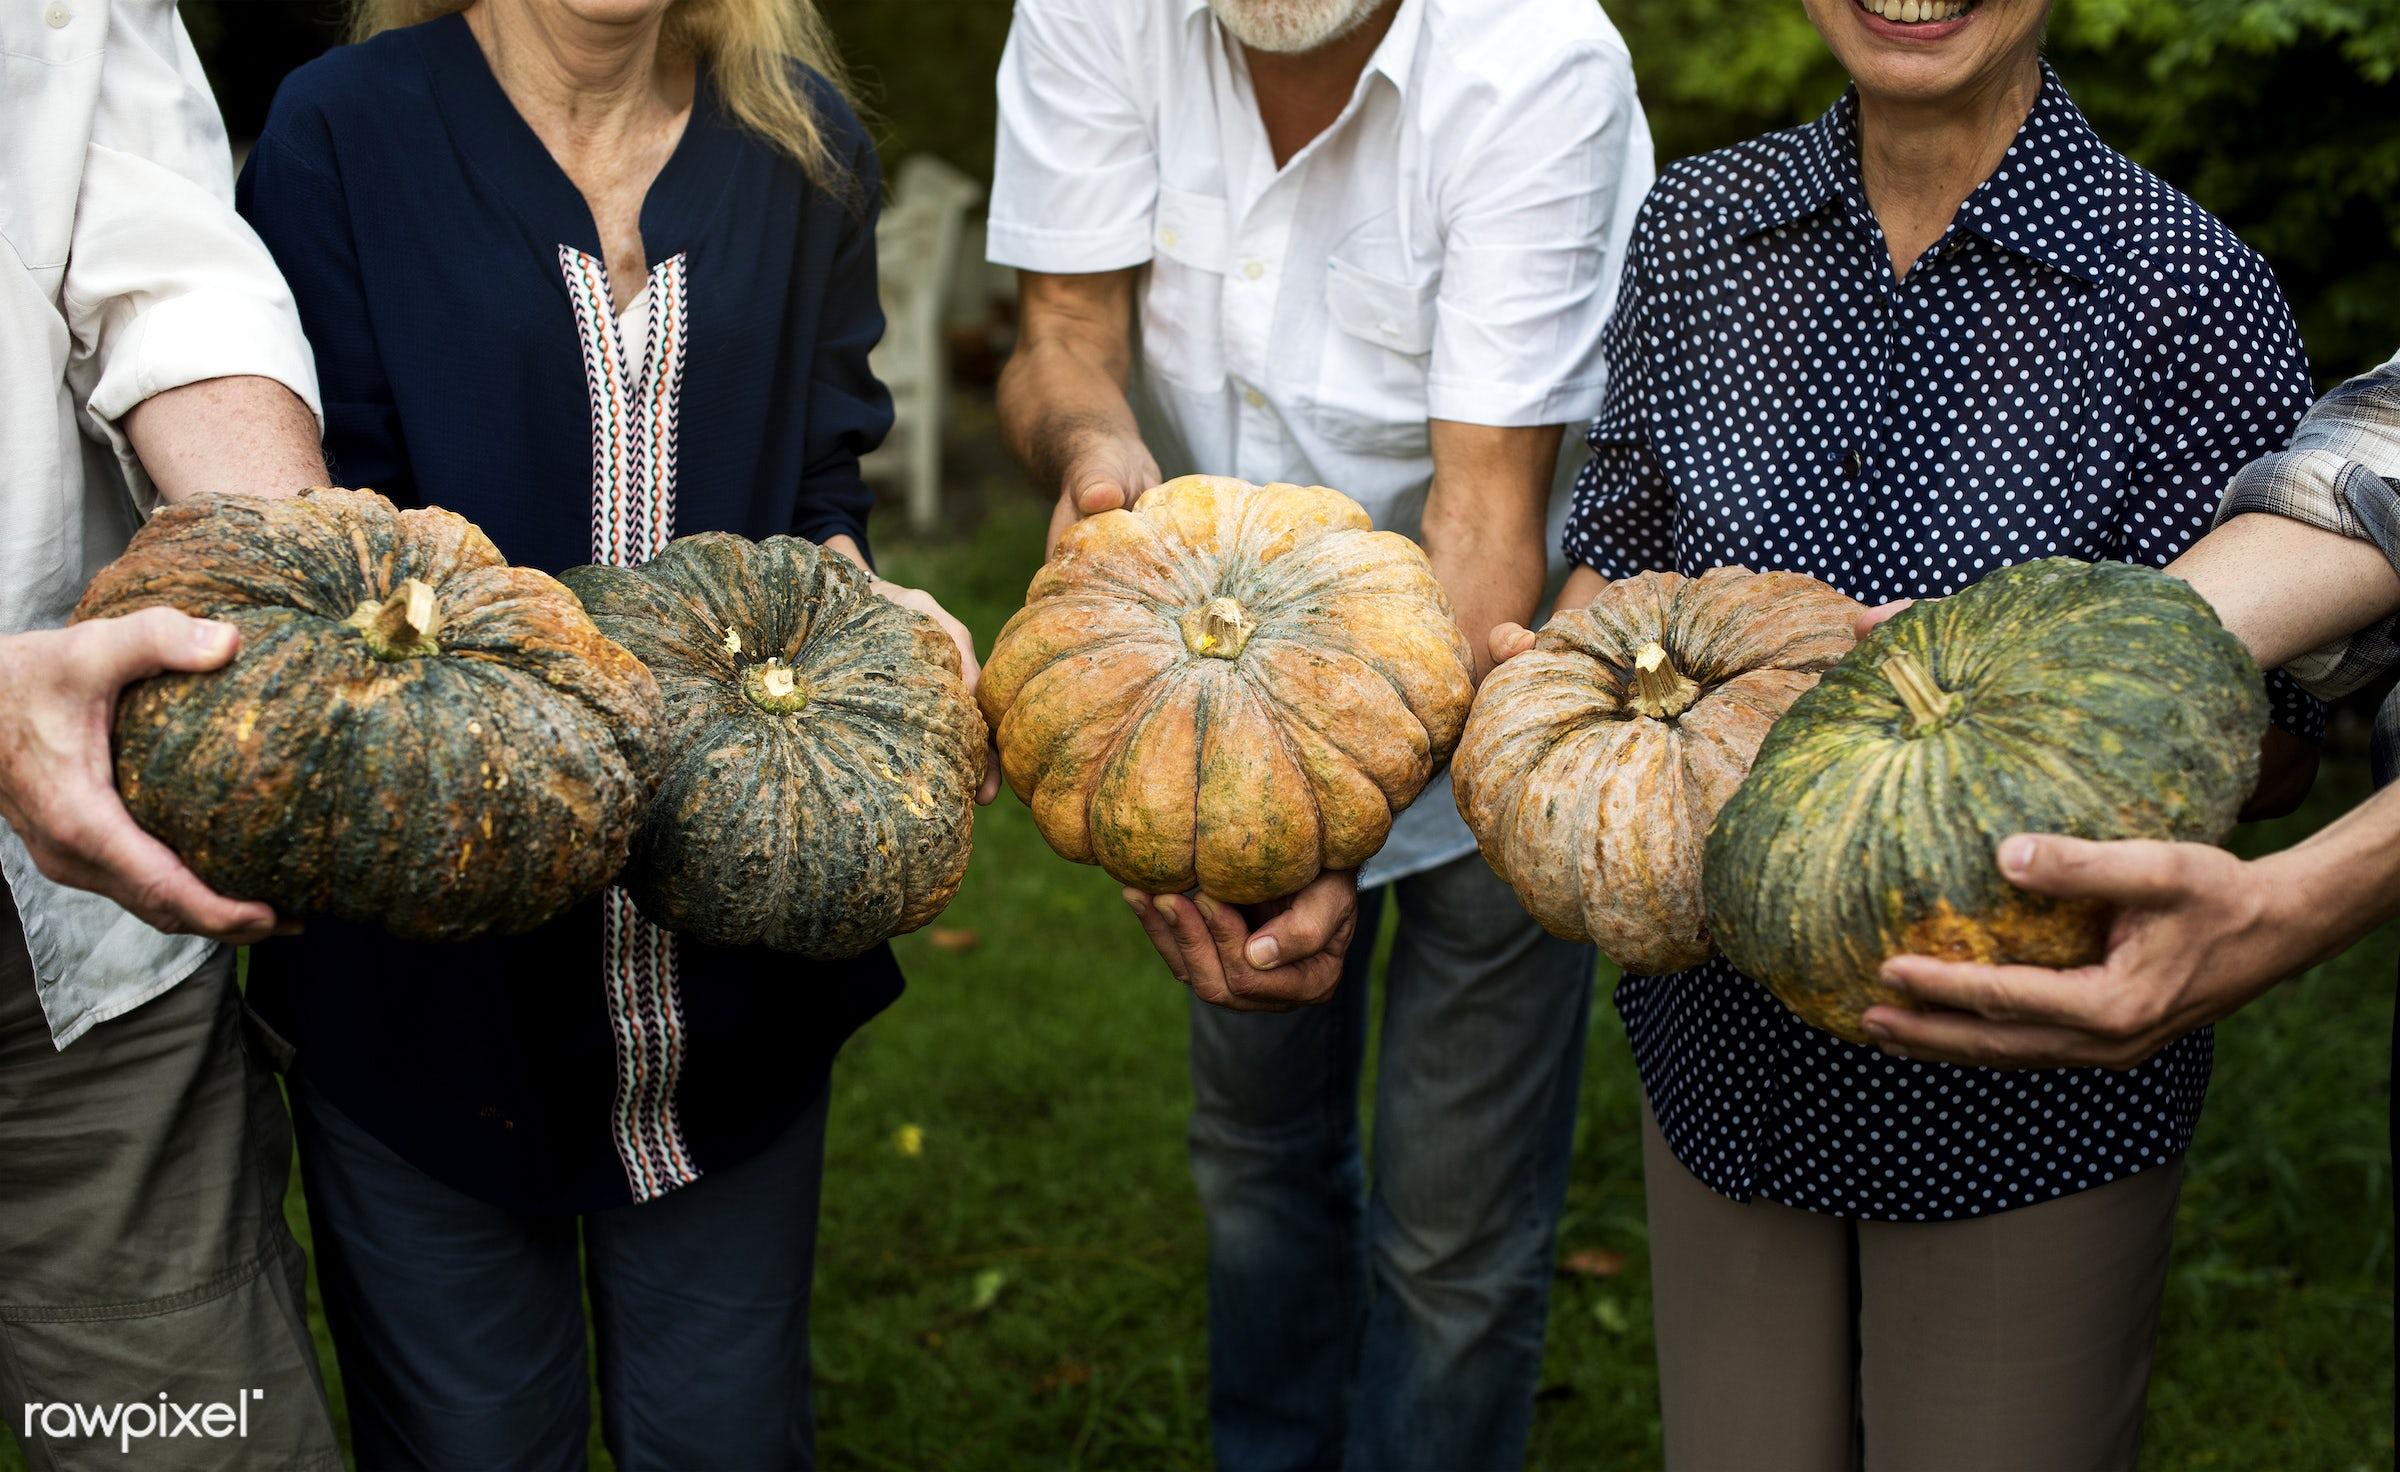 plant, raw, cuisine, diverse, people, crop, hands, fresh, woman, pick, cultivation, ingredient, man, pumpkin, agriculture,...